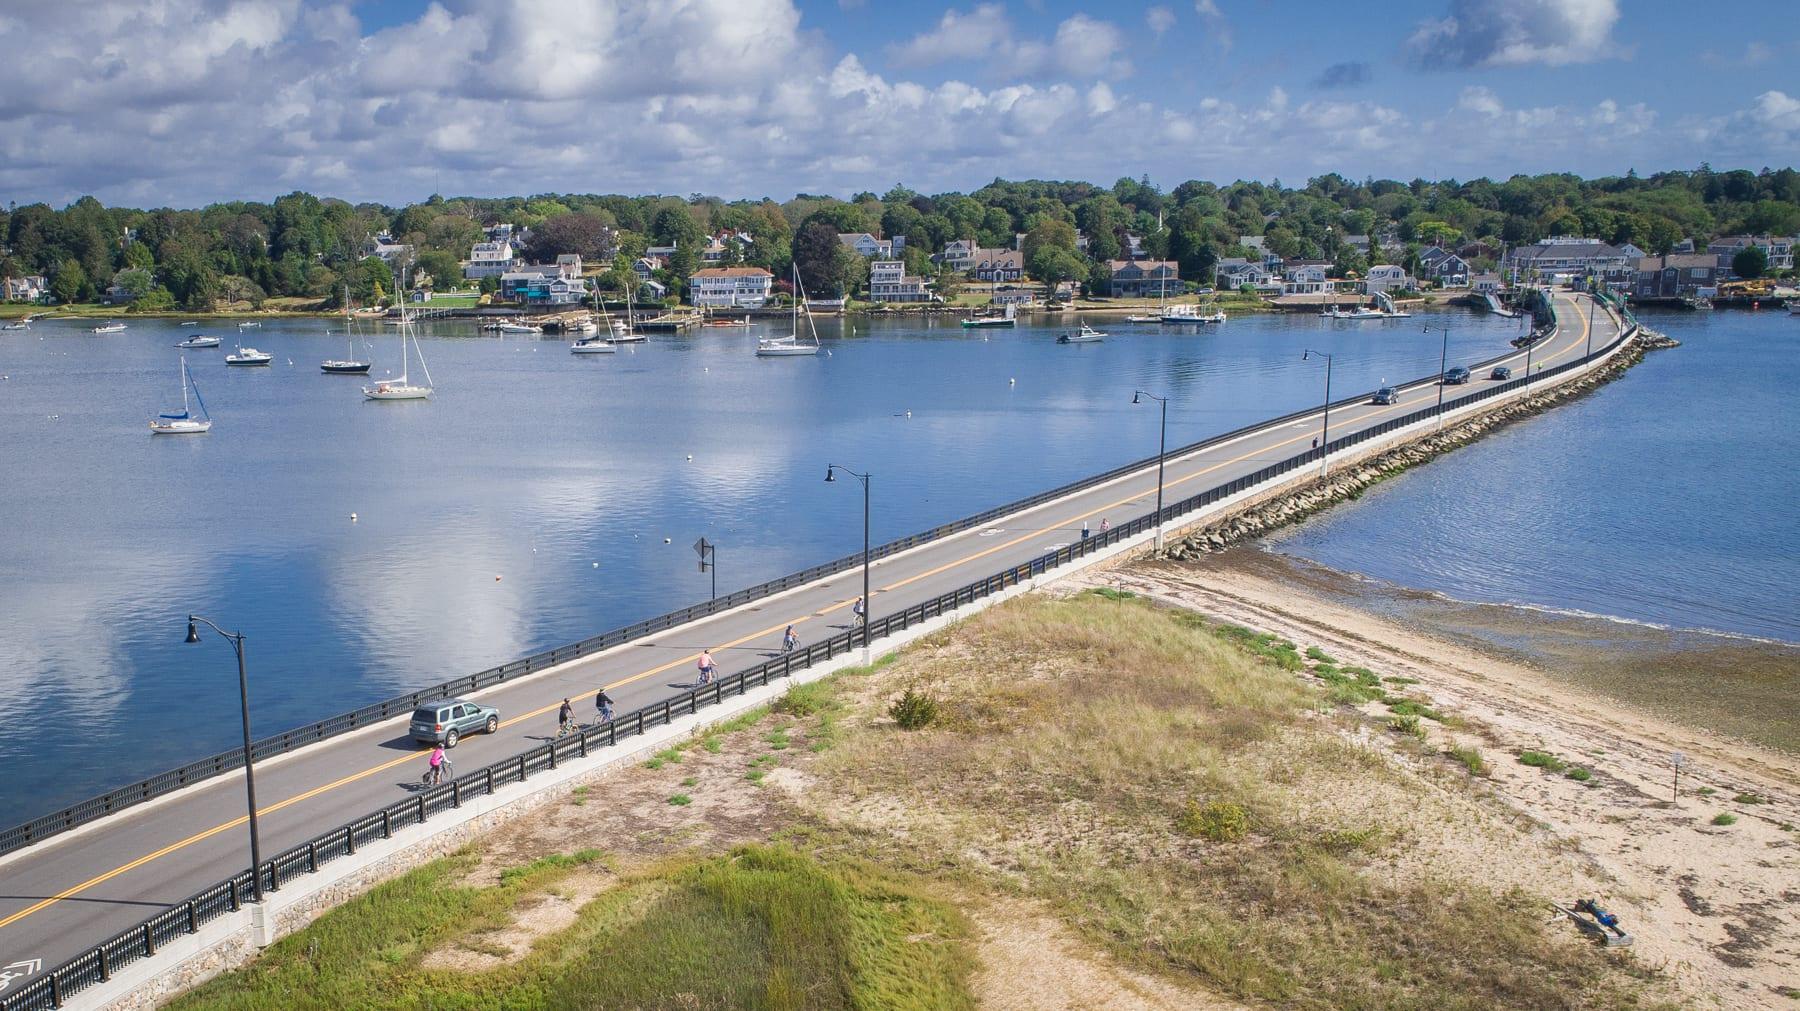 Members of the South Coast Bikeway Alliance ride across Dartmouth's Padanaram Bridge